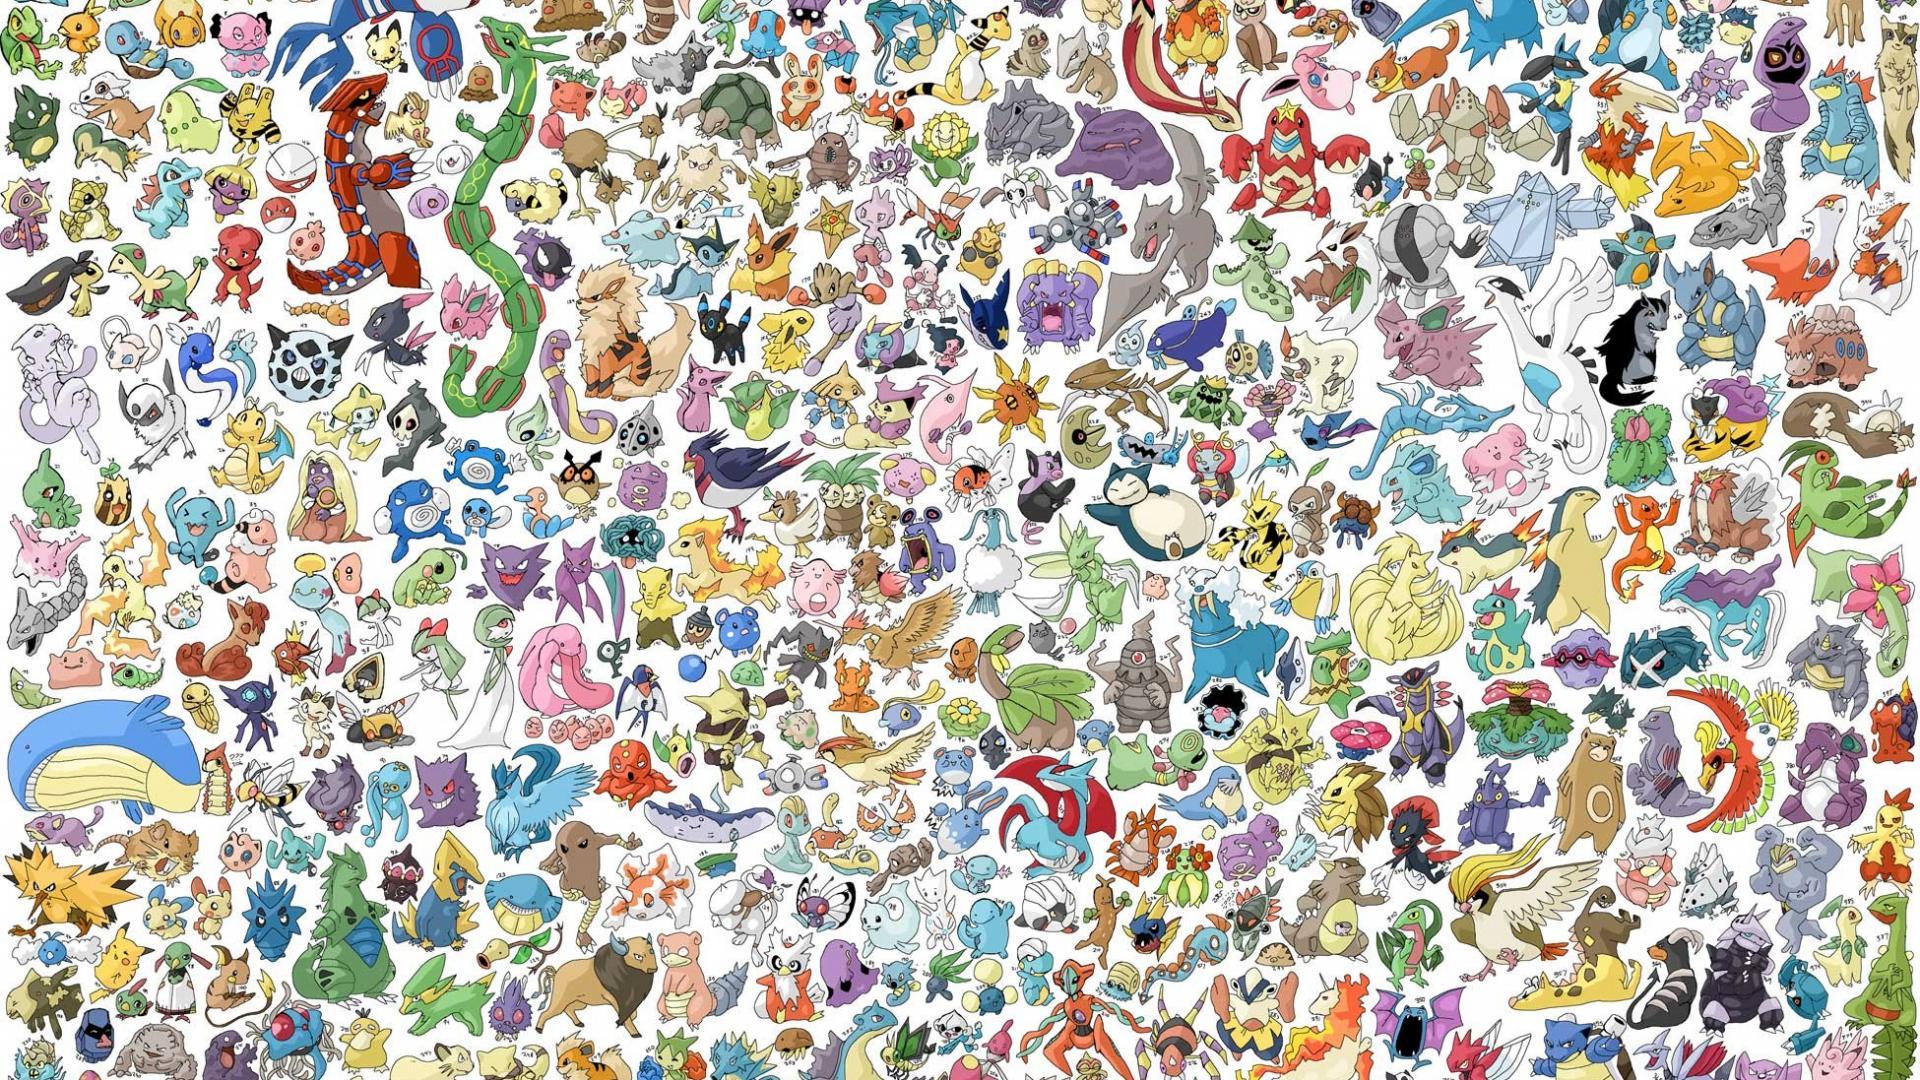 rowlett pokemon wallpaper tumblr - photo #44